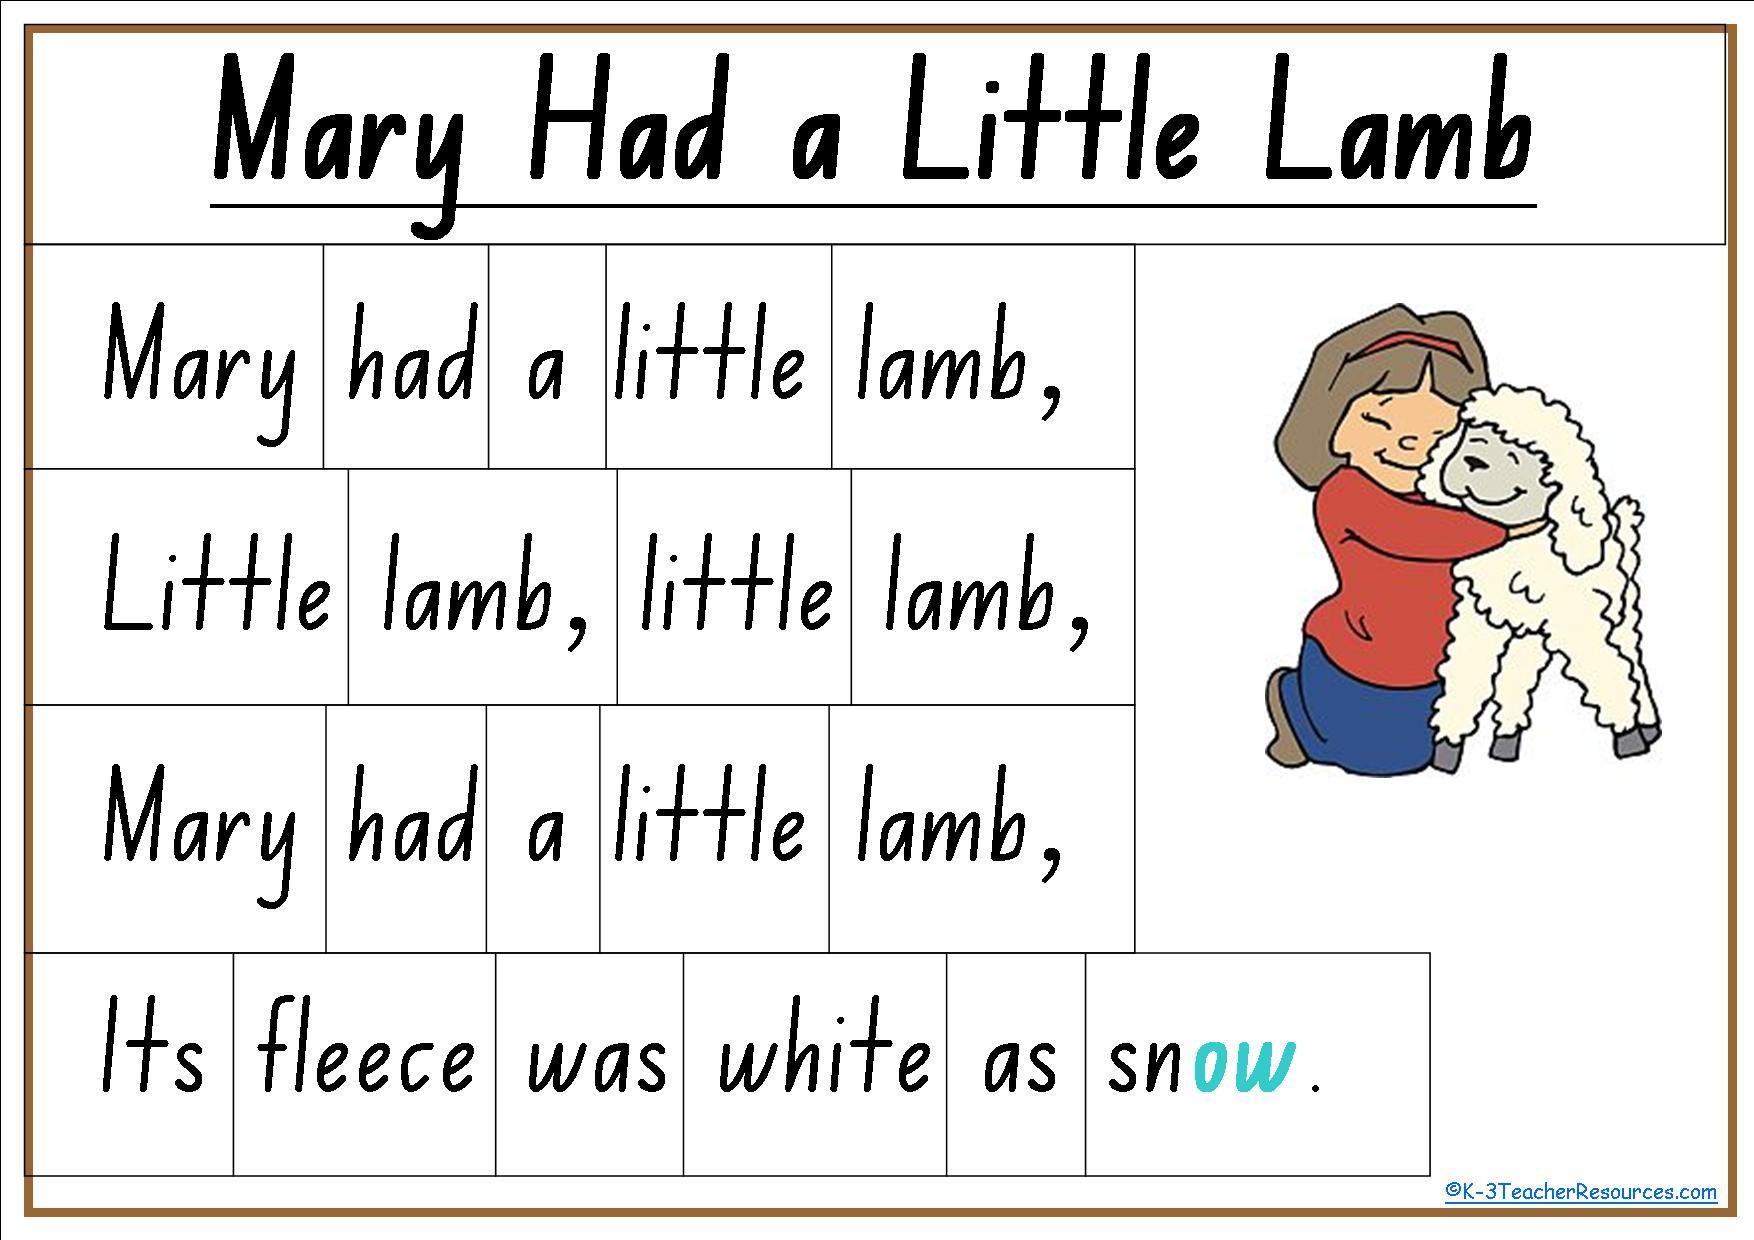 Mary Had A Little Lamb Nursery Rhyme Lyrics Chart